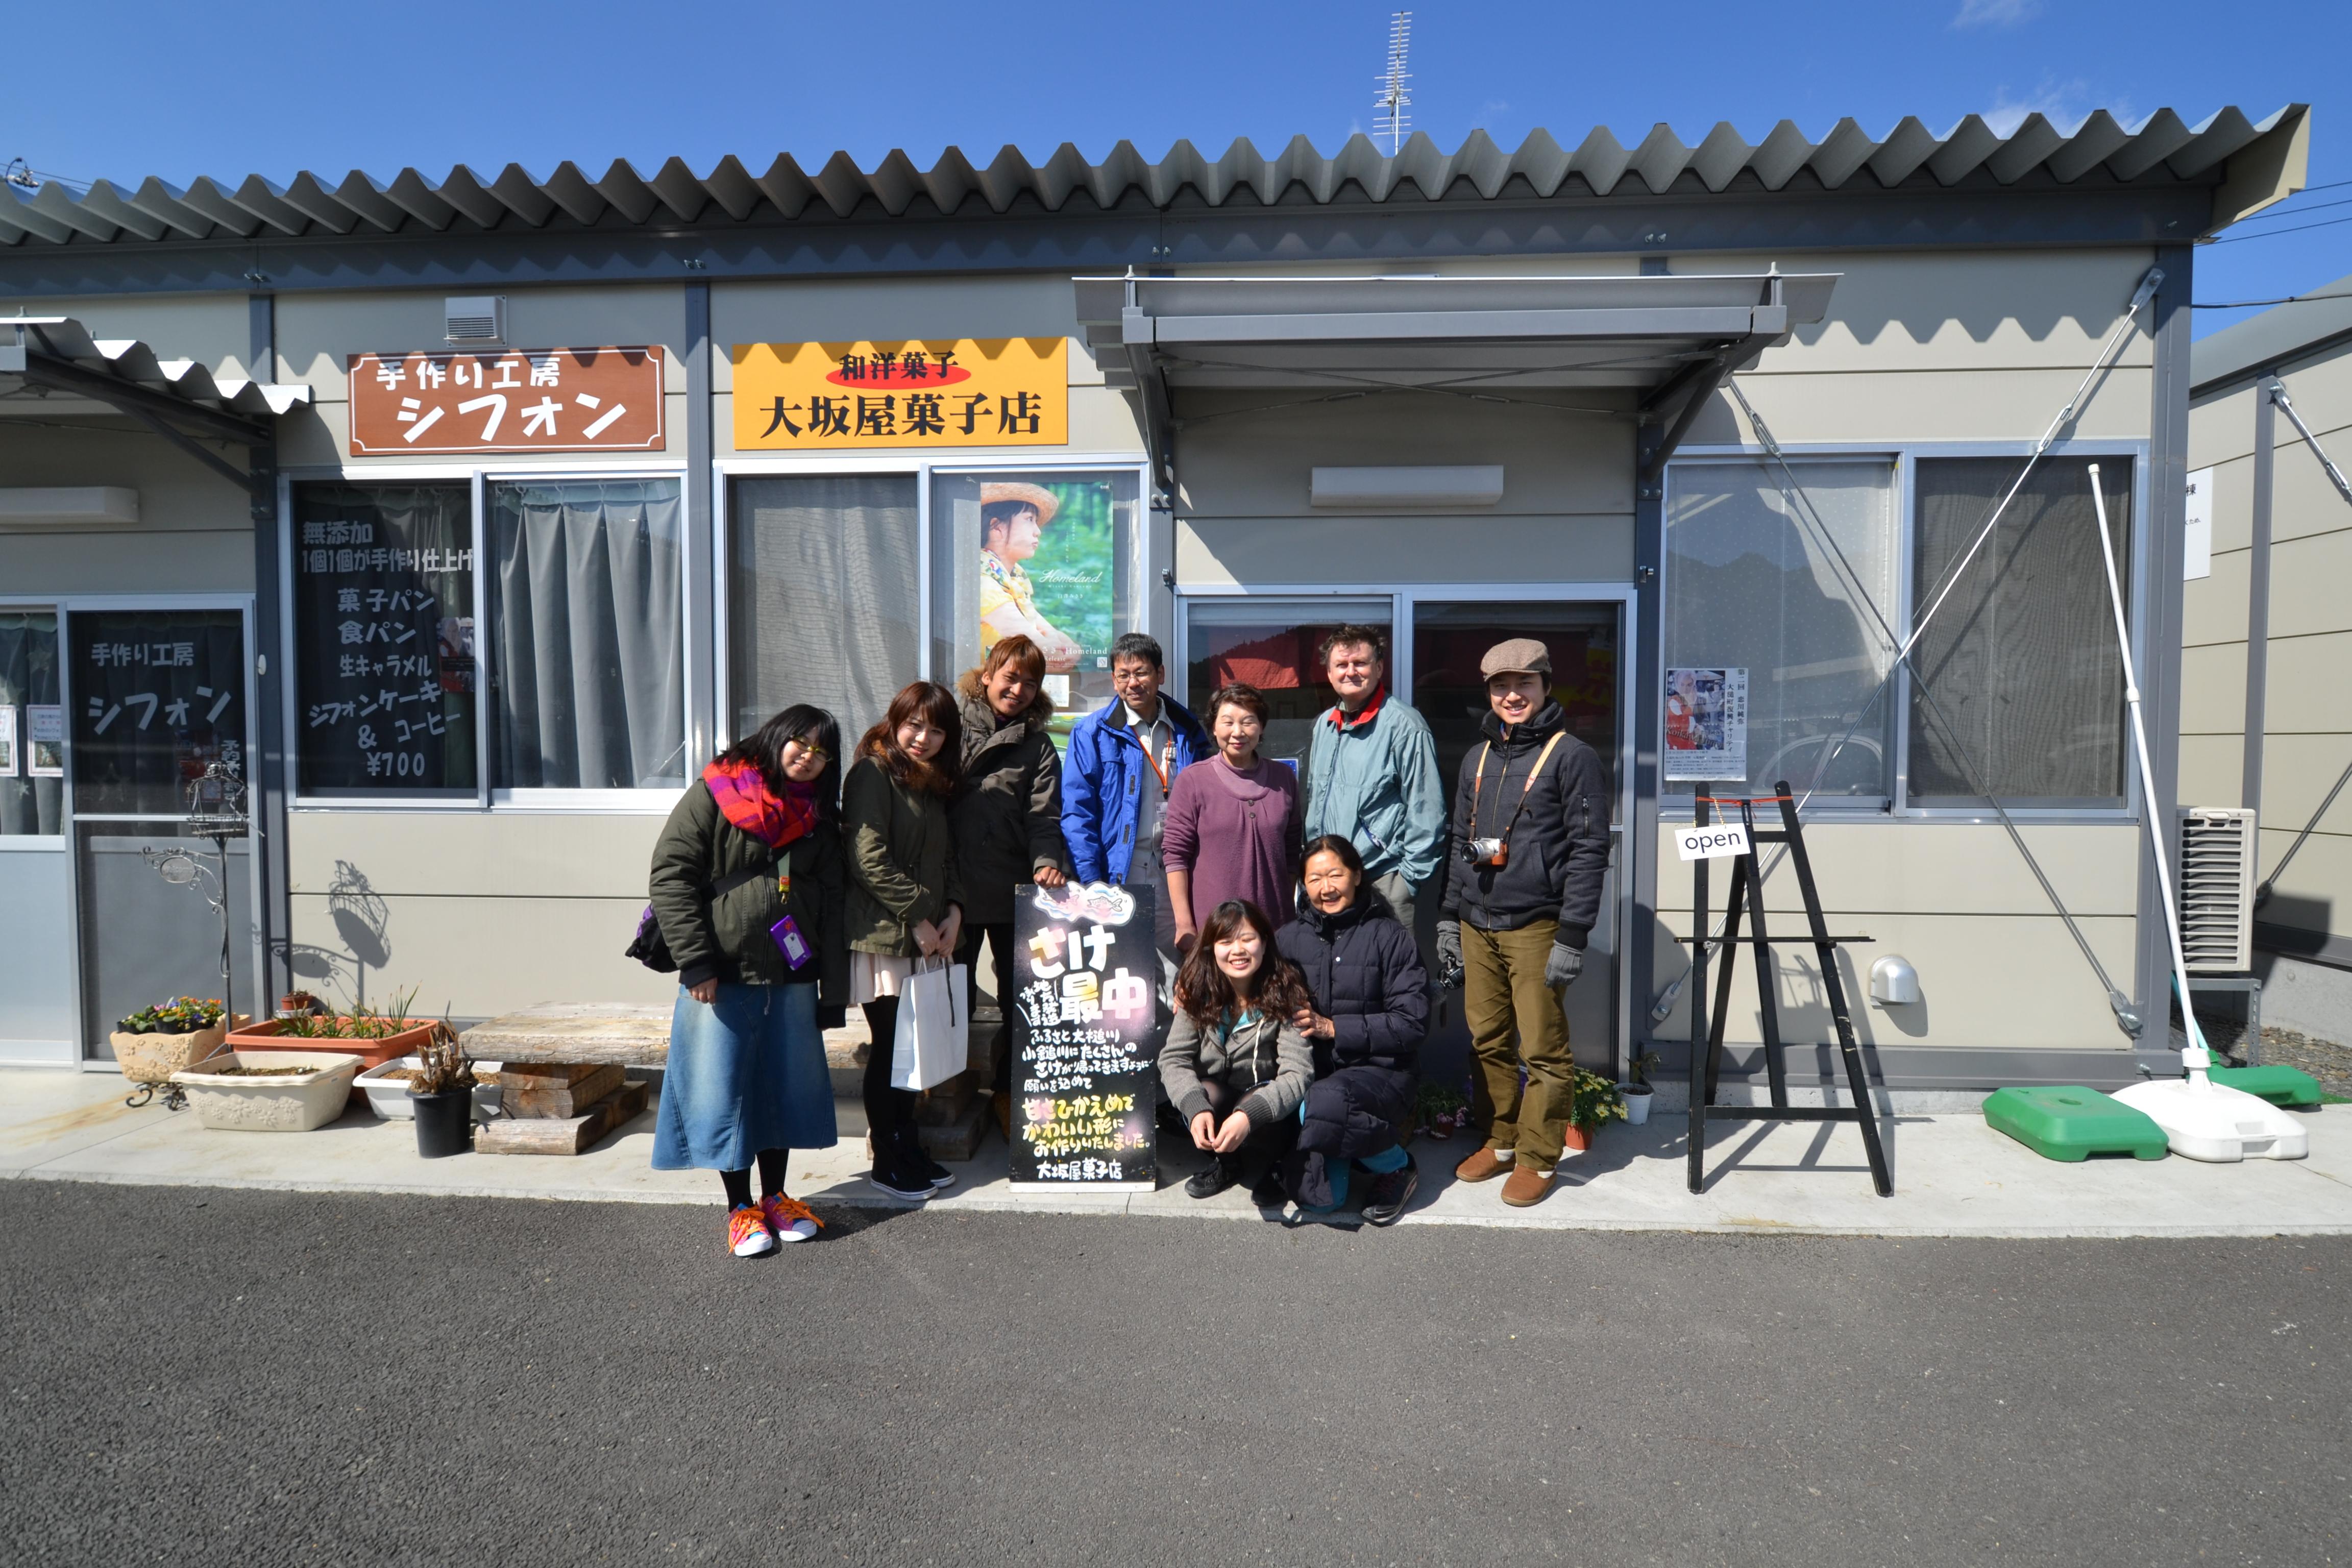 otsuchi temporary shopping centre bakery osaka ya with film crew.JPG